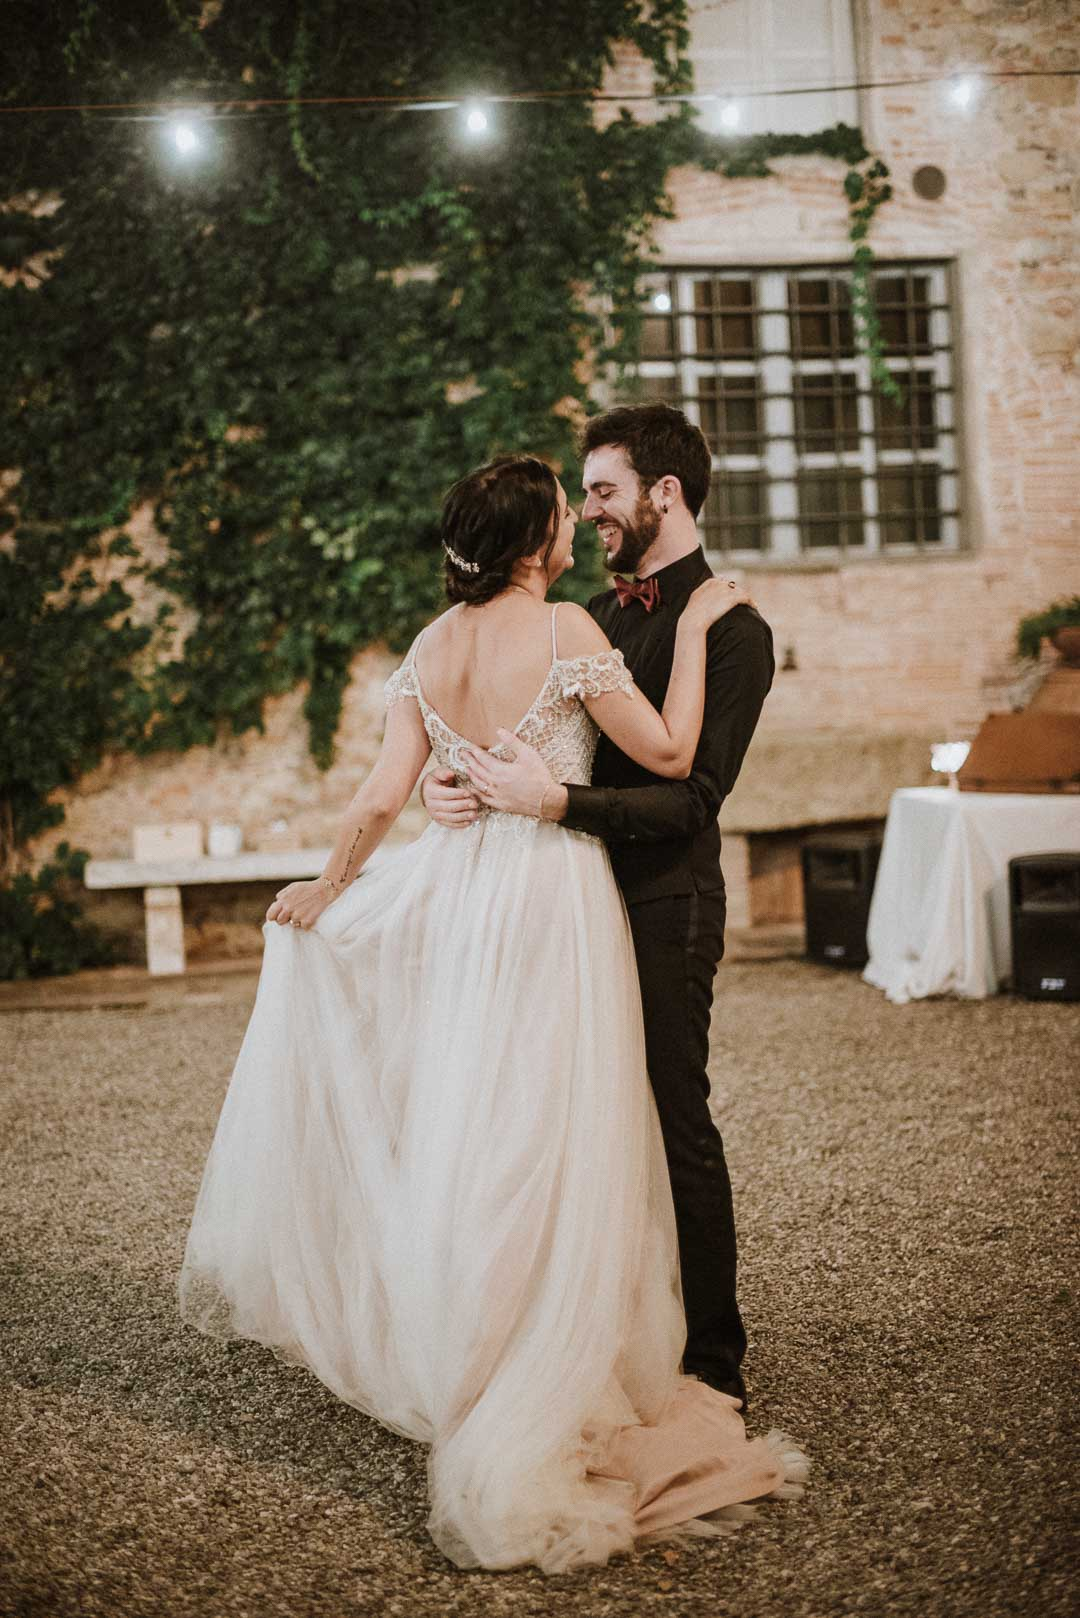 wedding-photographer-destination-fineart-bespoke-reportage-tuscany-villascorzi-vivianeizzo-spazio46-182